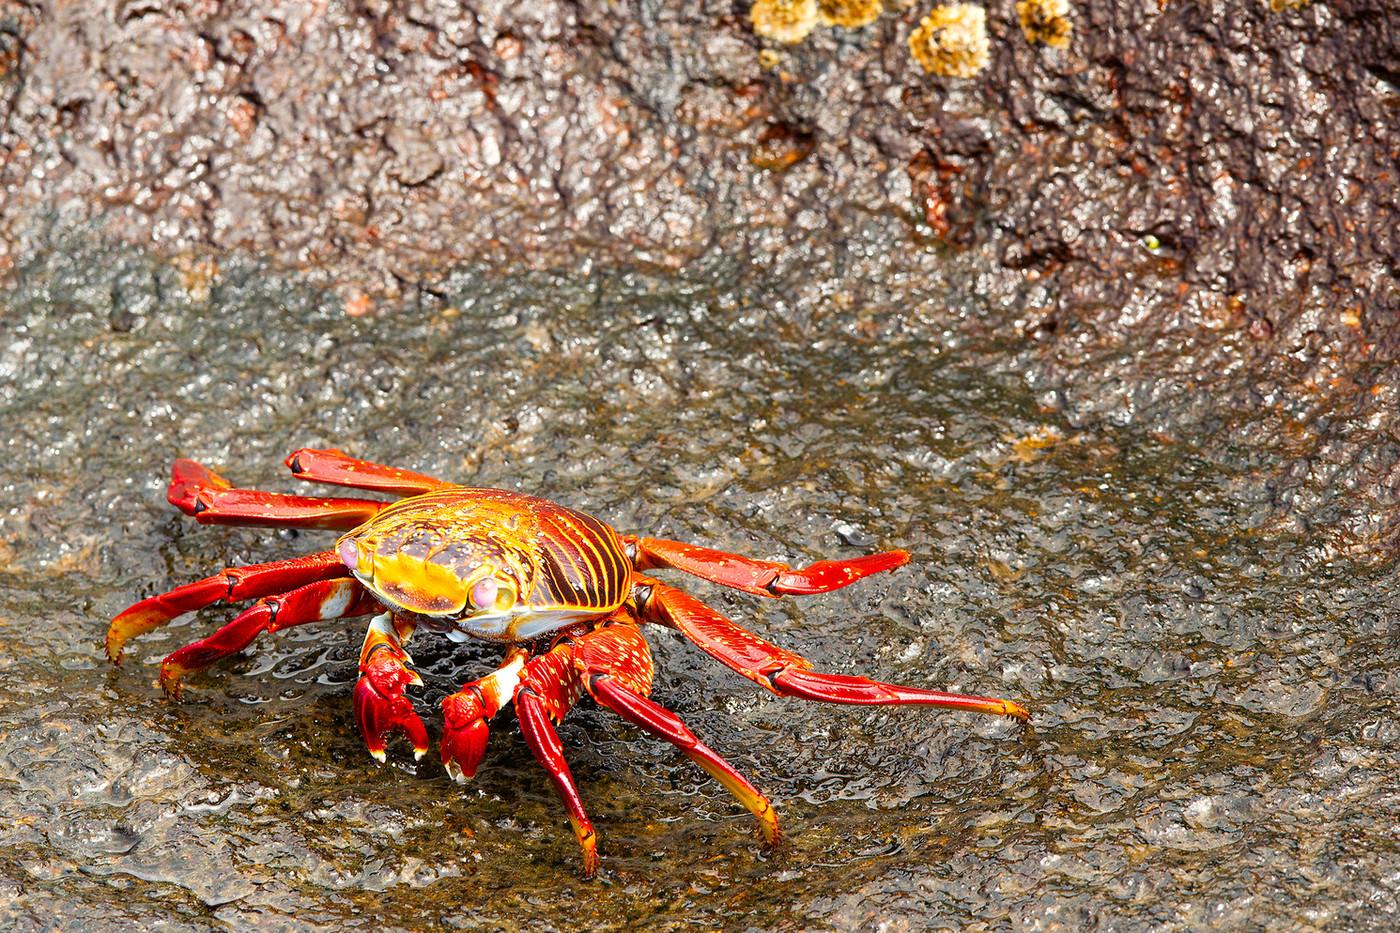 Sally Lightfoot Crab in the Galapagos Islands, Equador